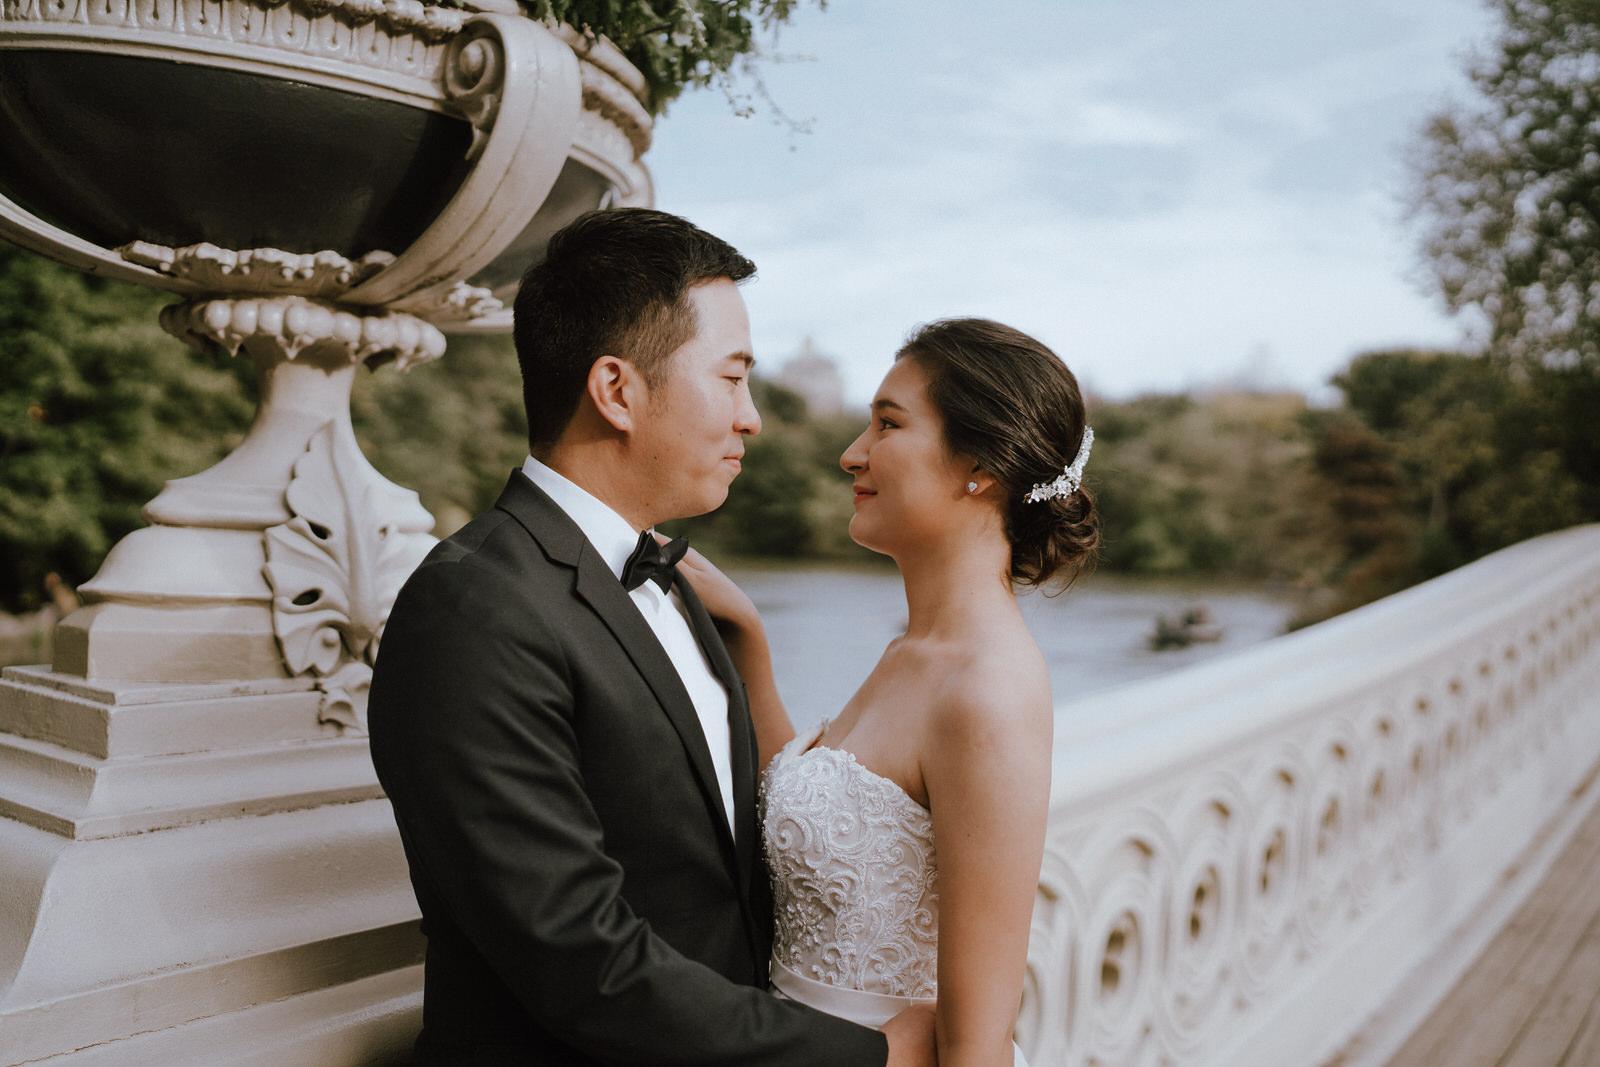 Central Park Elopement Photos-Bow Bridge-Michelle Gonzalez Photography- New York Wedding Photographer-7.jpg